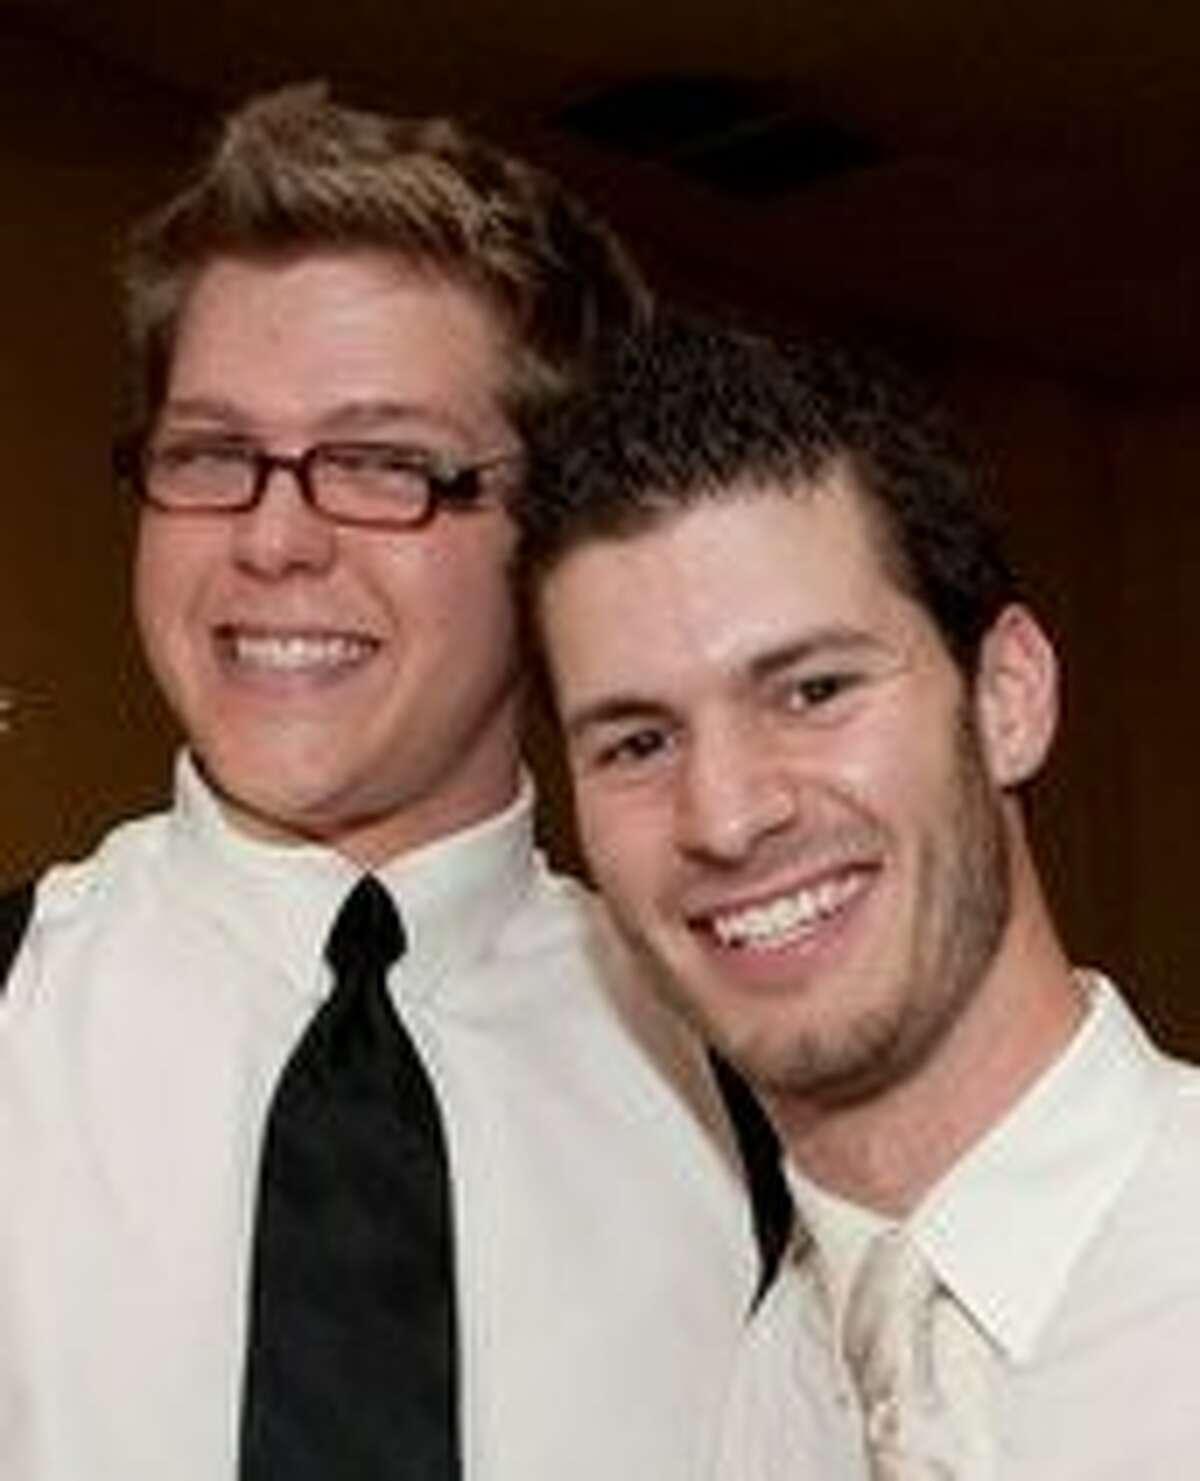 Dominic Pallotta, right, and Beavan Blocker, are graduates of The Woodlands High School.